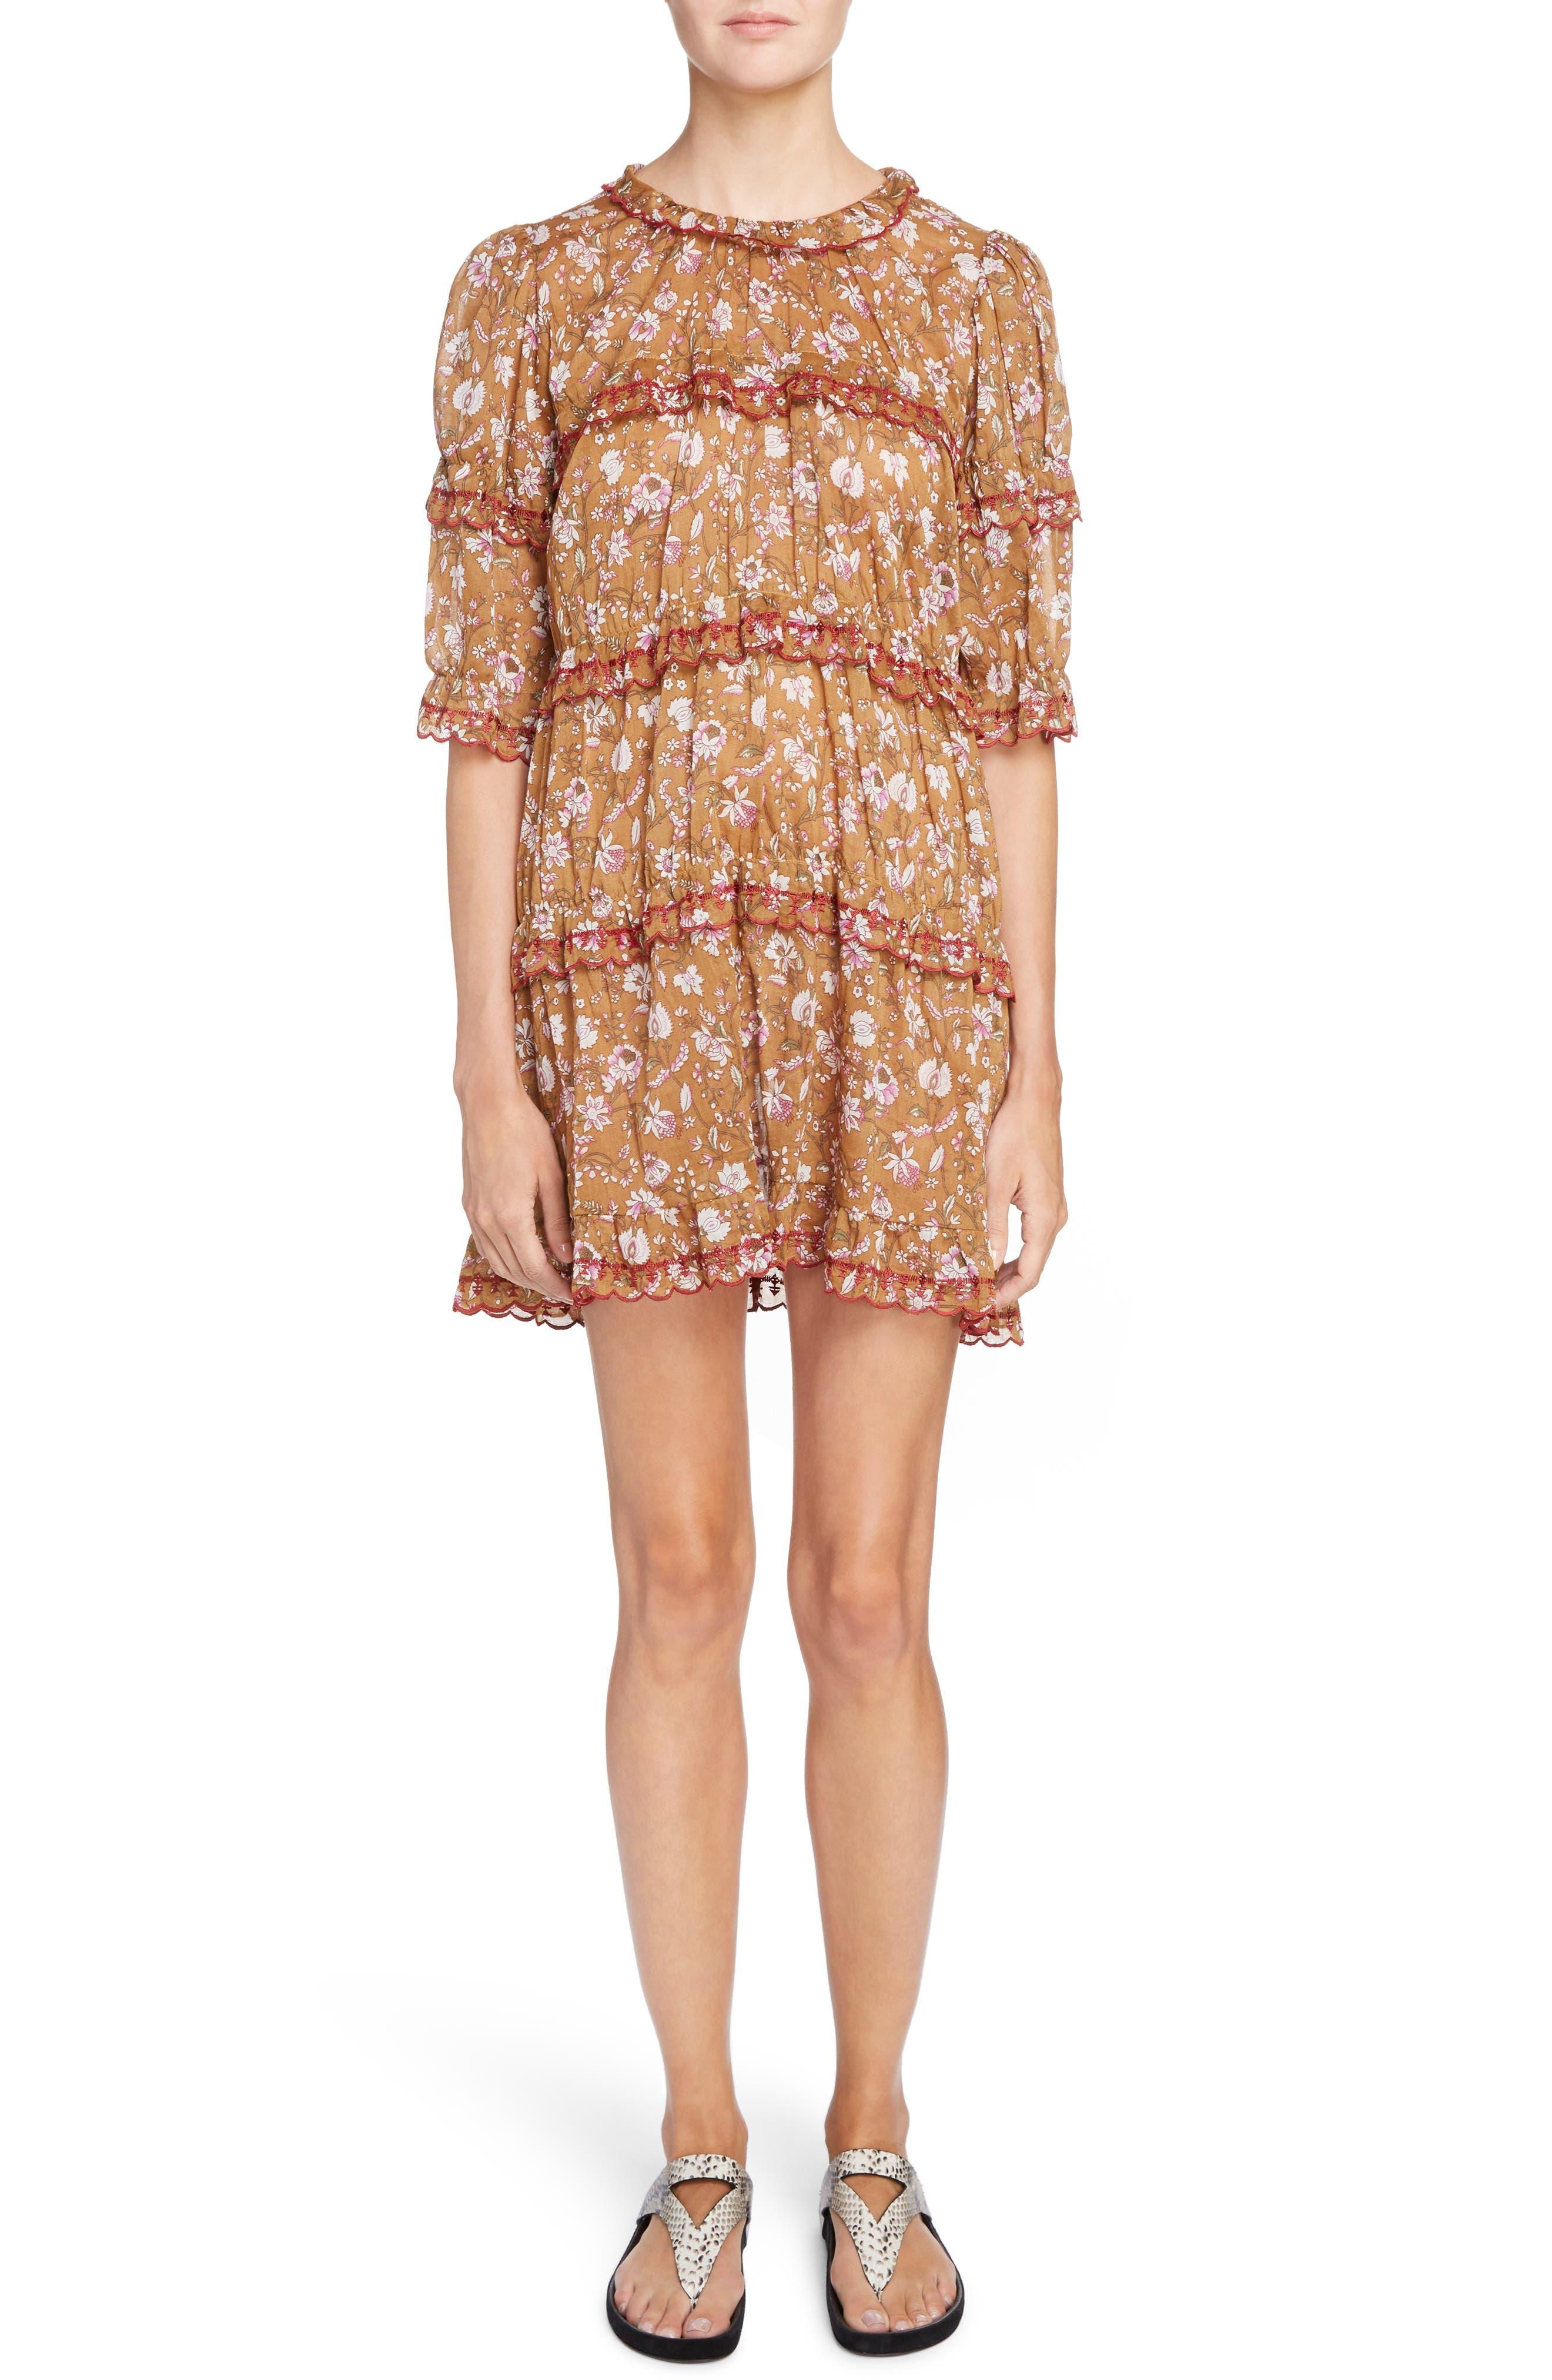 Alternate Image 1 Selected - Isabel Marant Étoile Maiwenn Floral Print Cotton Dress